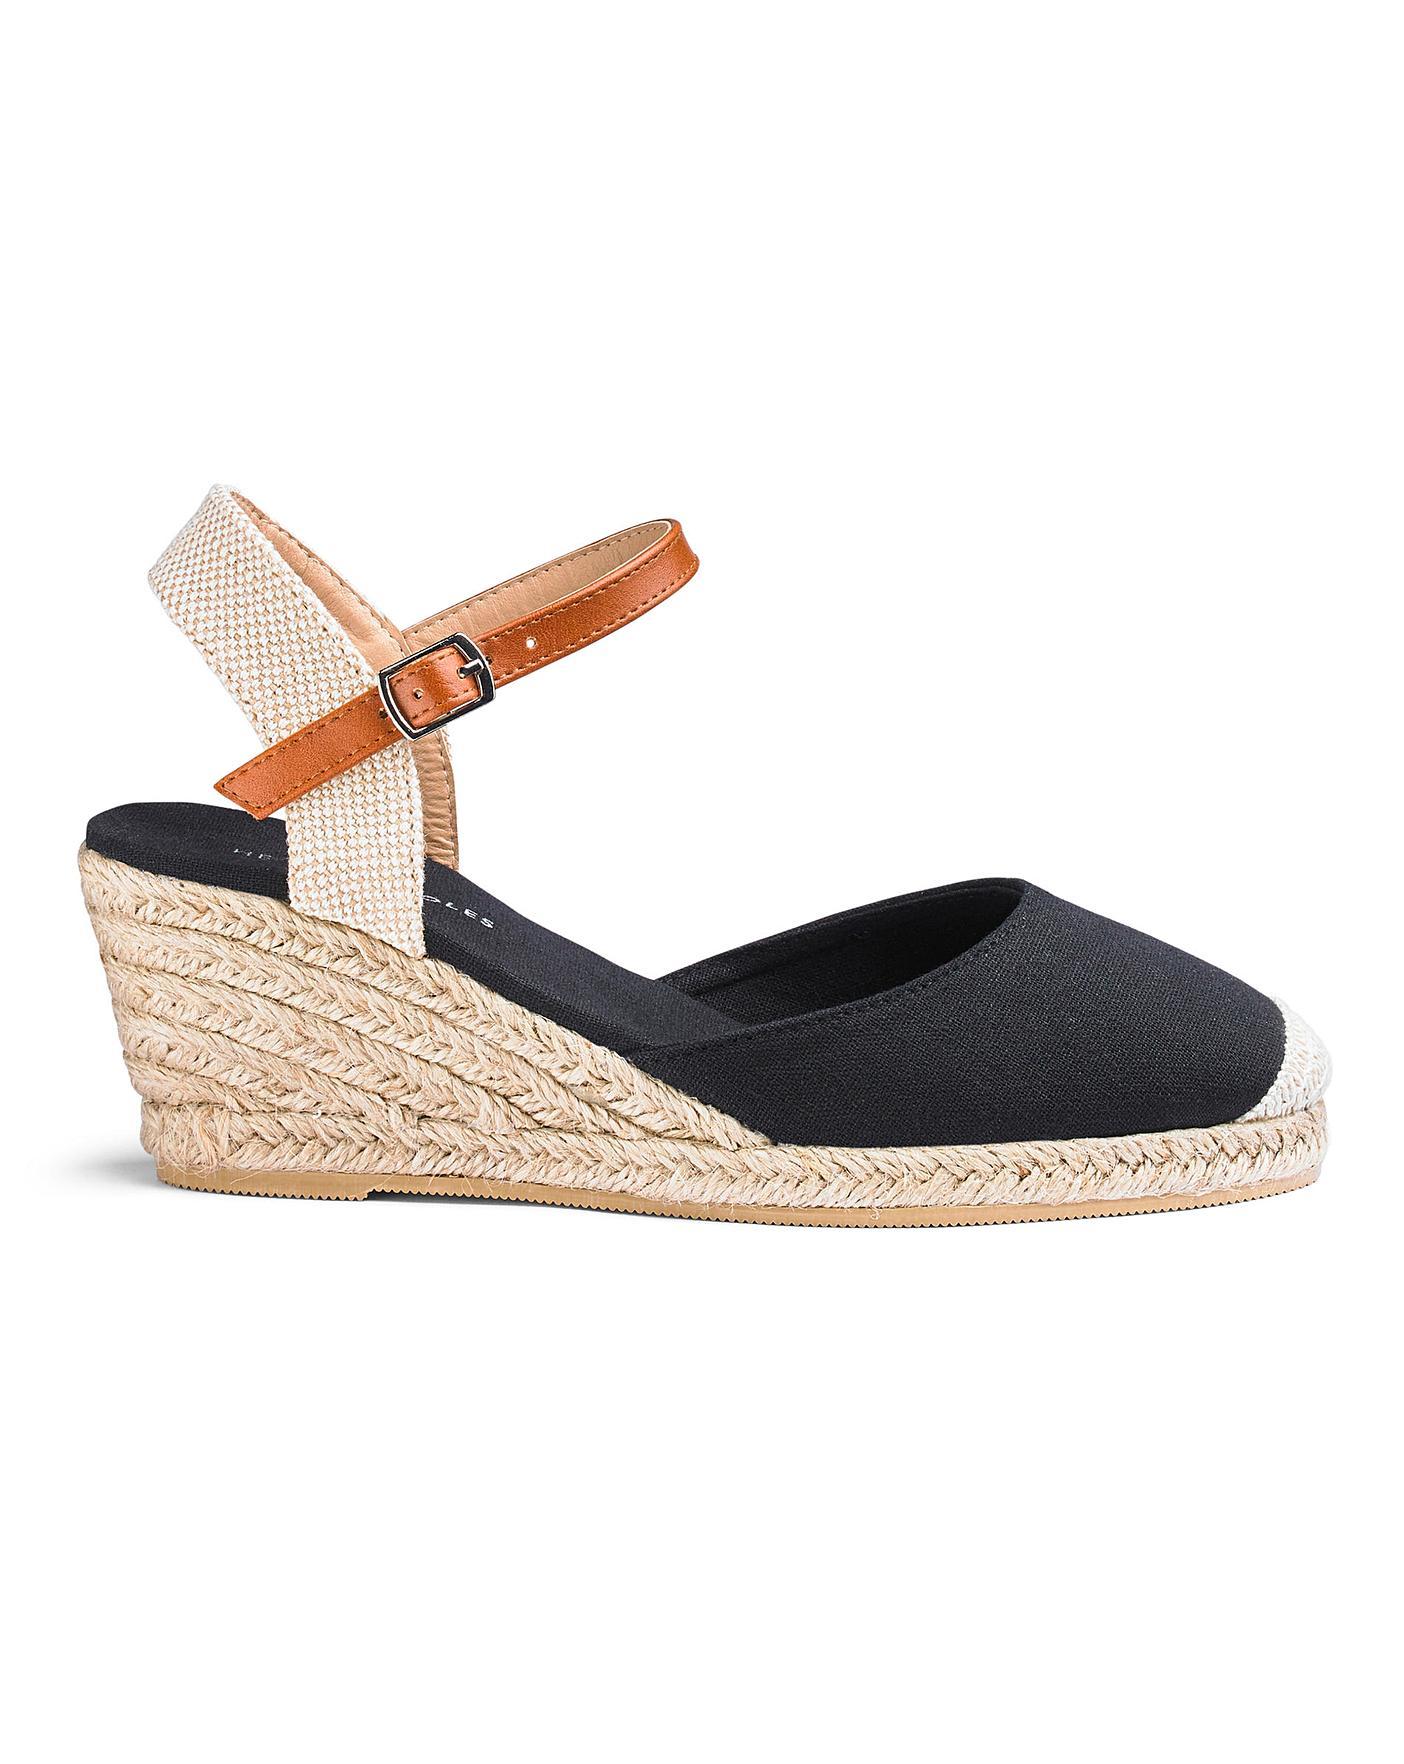 Espadrille Wedge Sandals EEE Fit | J D